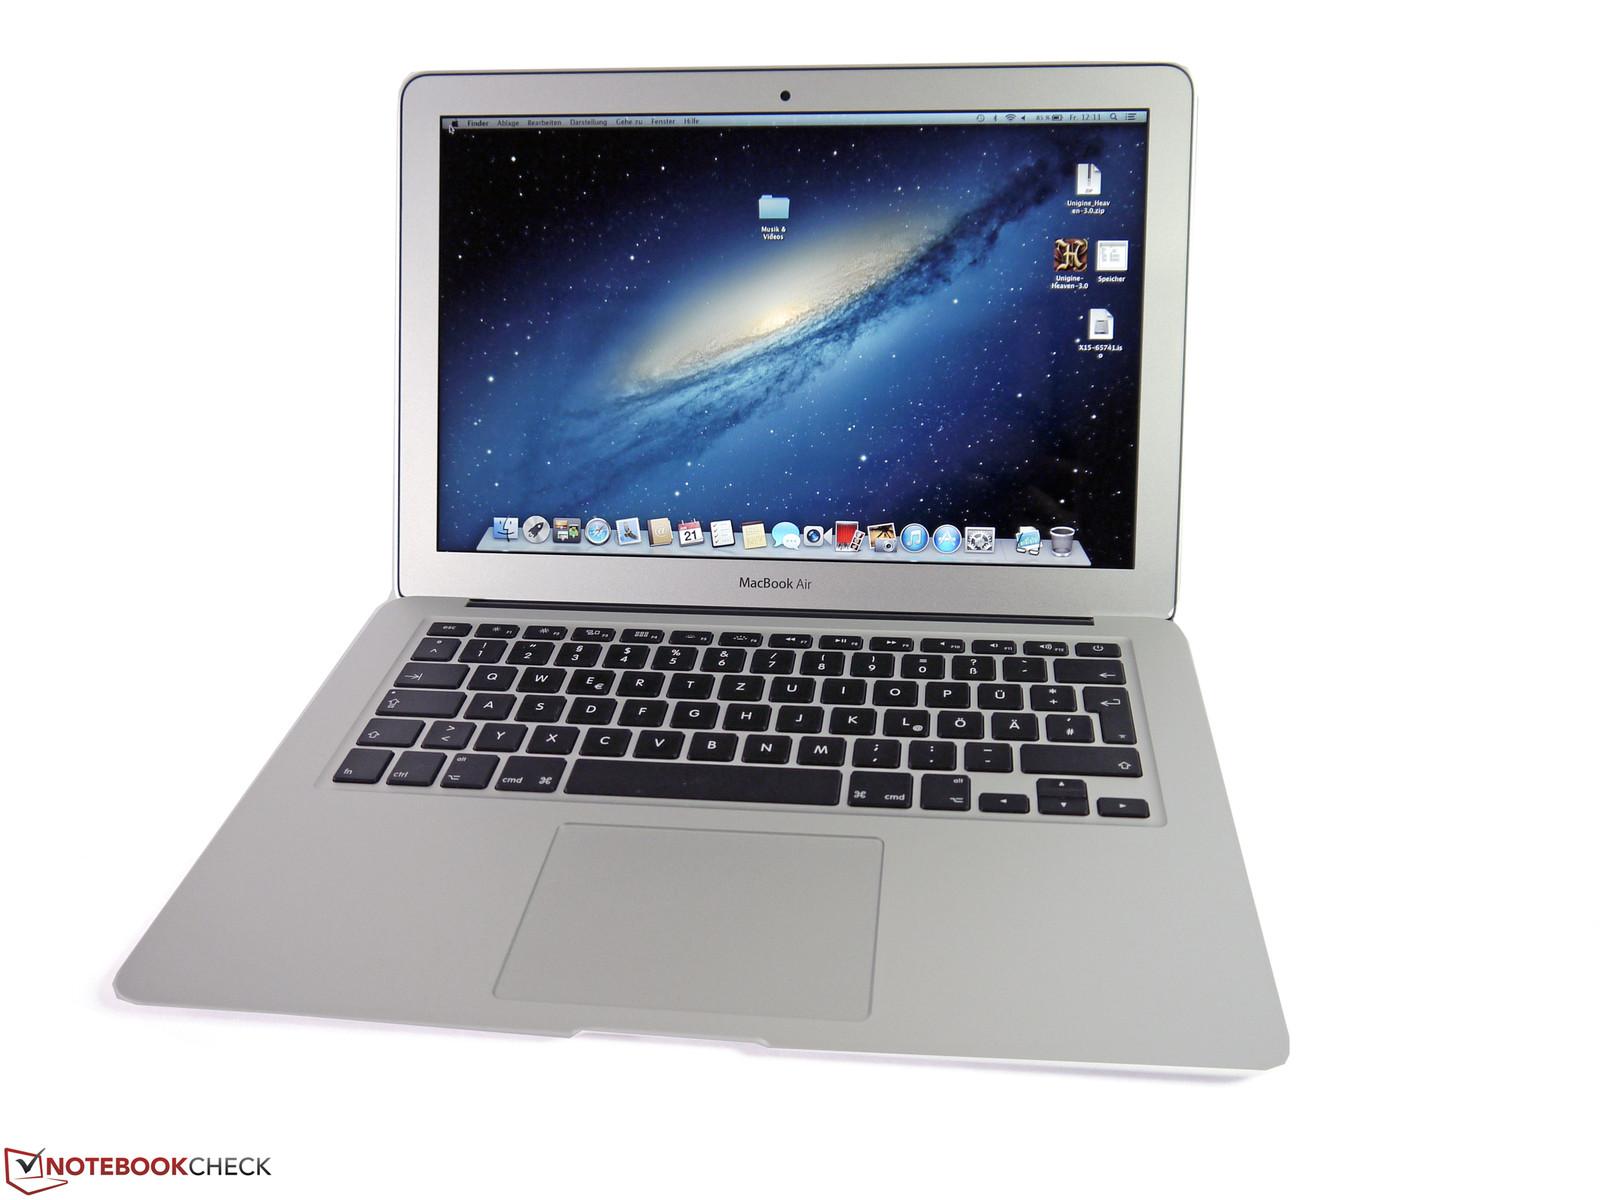 macbook air weight 2014